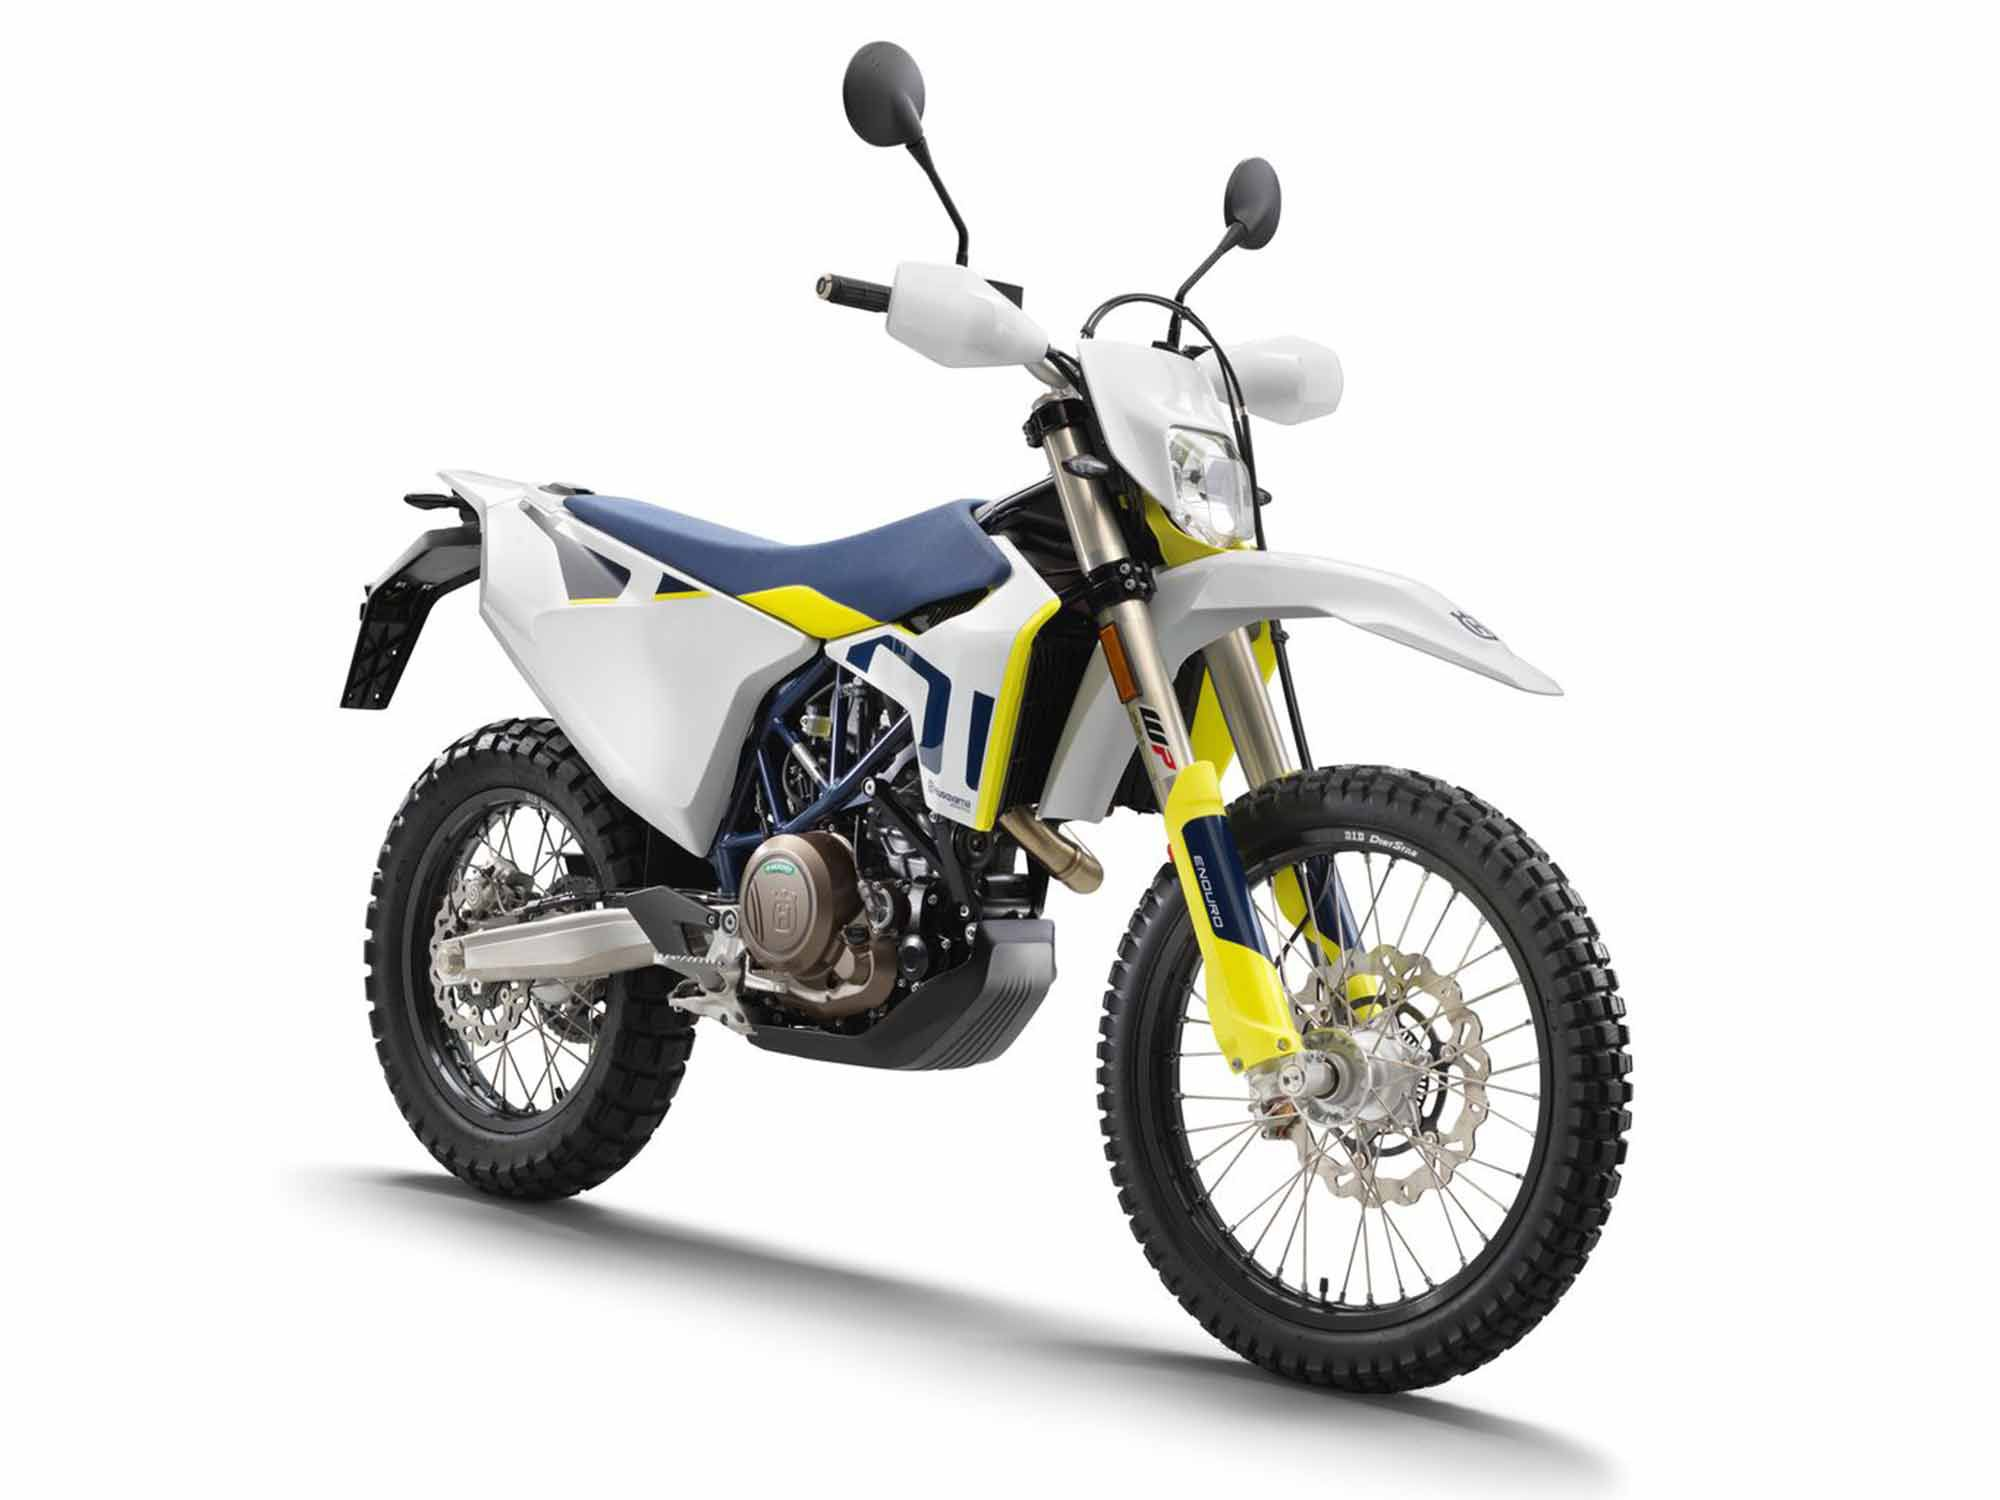 2020 Husqvarna 701 Enduro